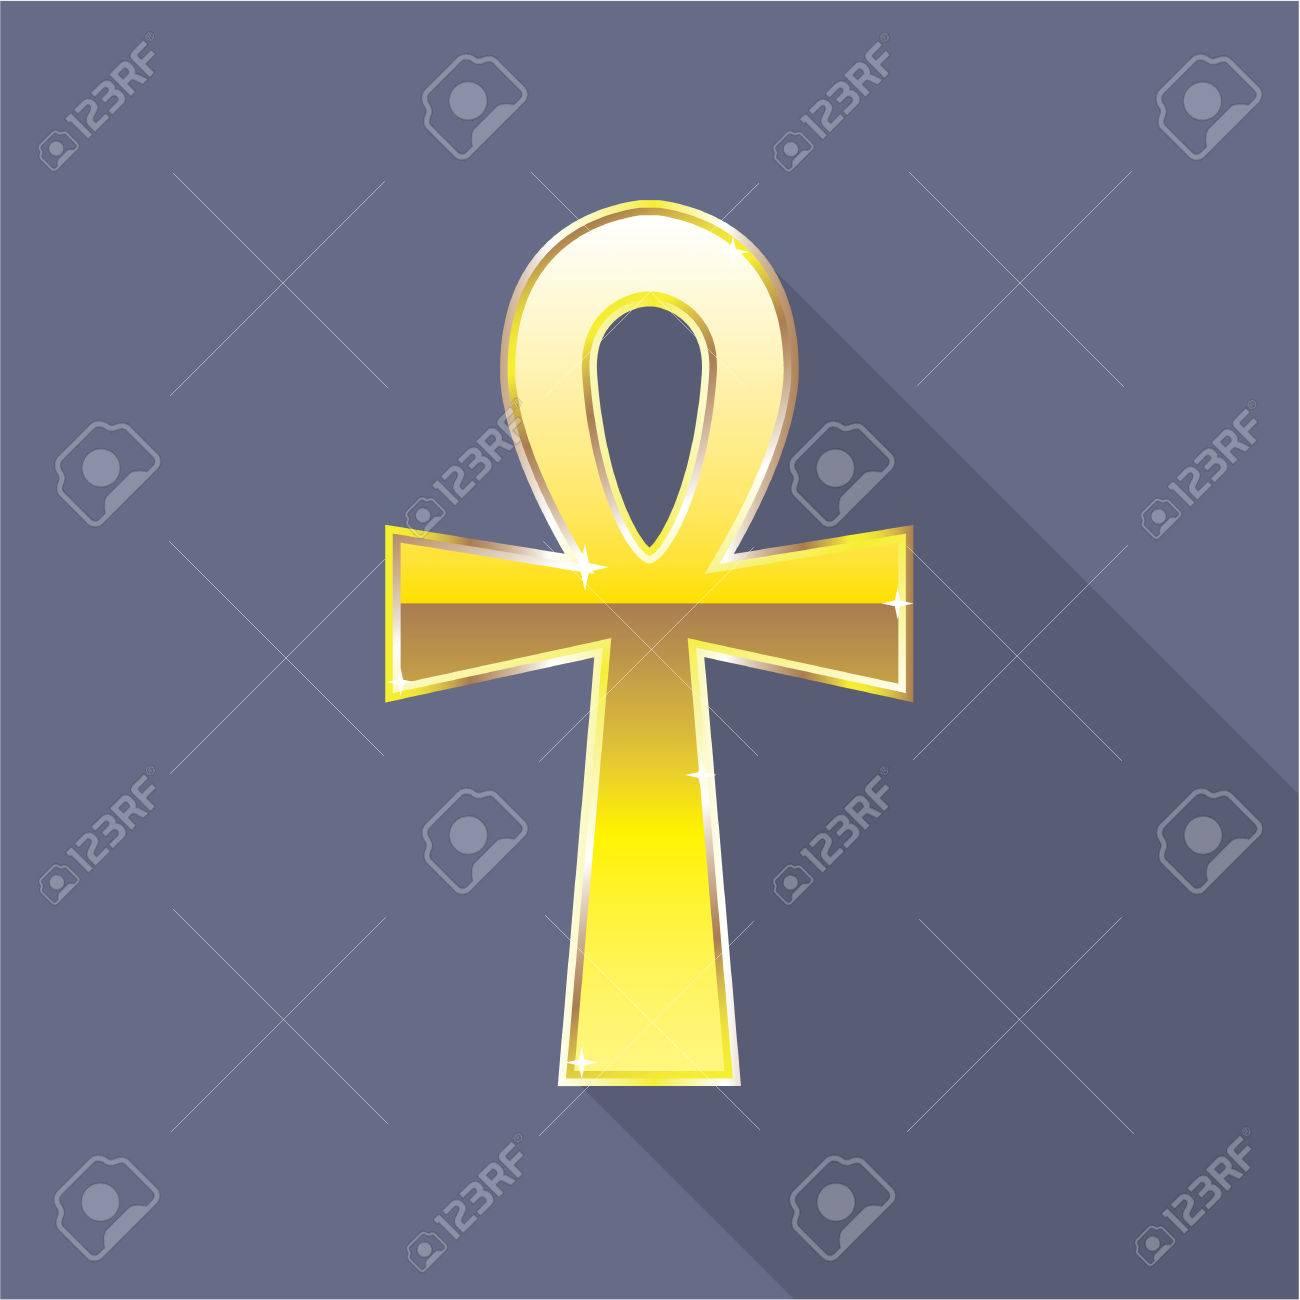 Egyptian cross key of nile ankh gold vector illustration clip art egyptian cross key of nile ankh gold vector illustration clip art stock vector 69556862 buycottarizona Image collections